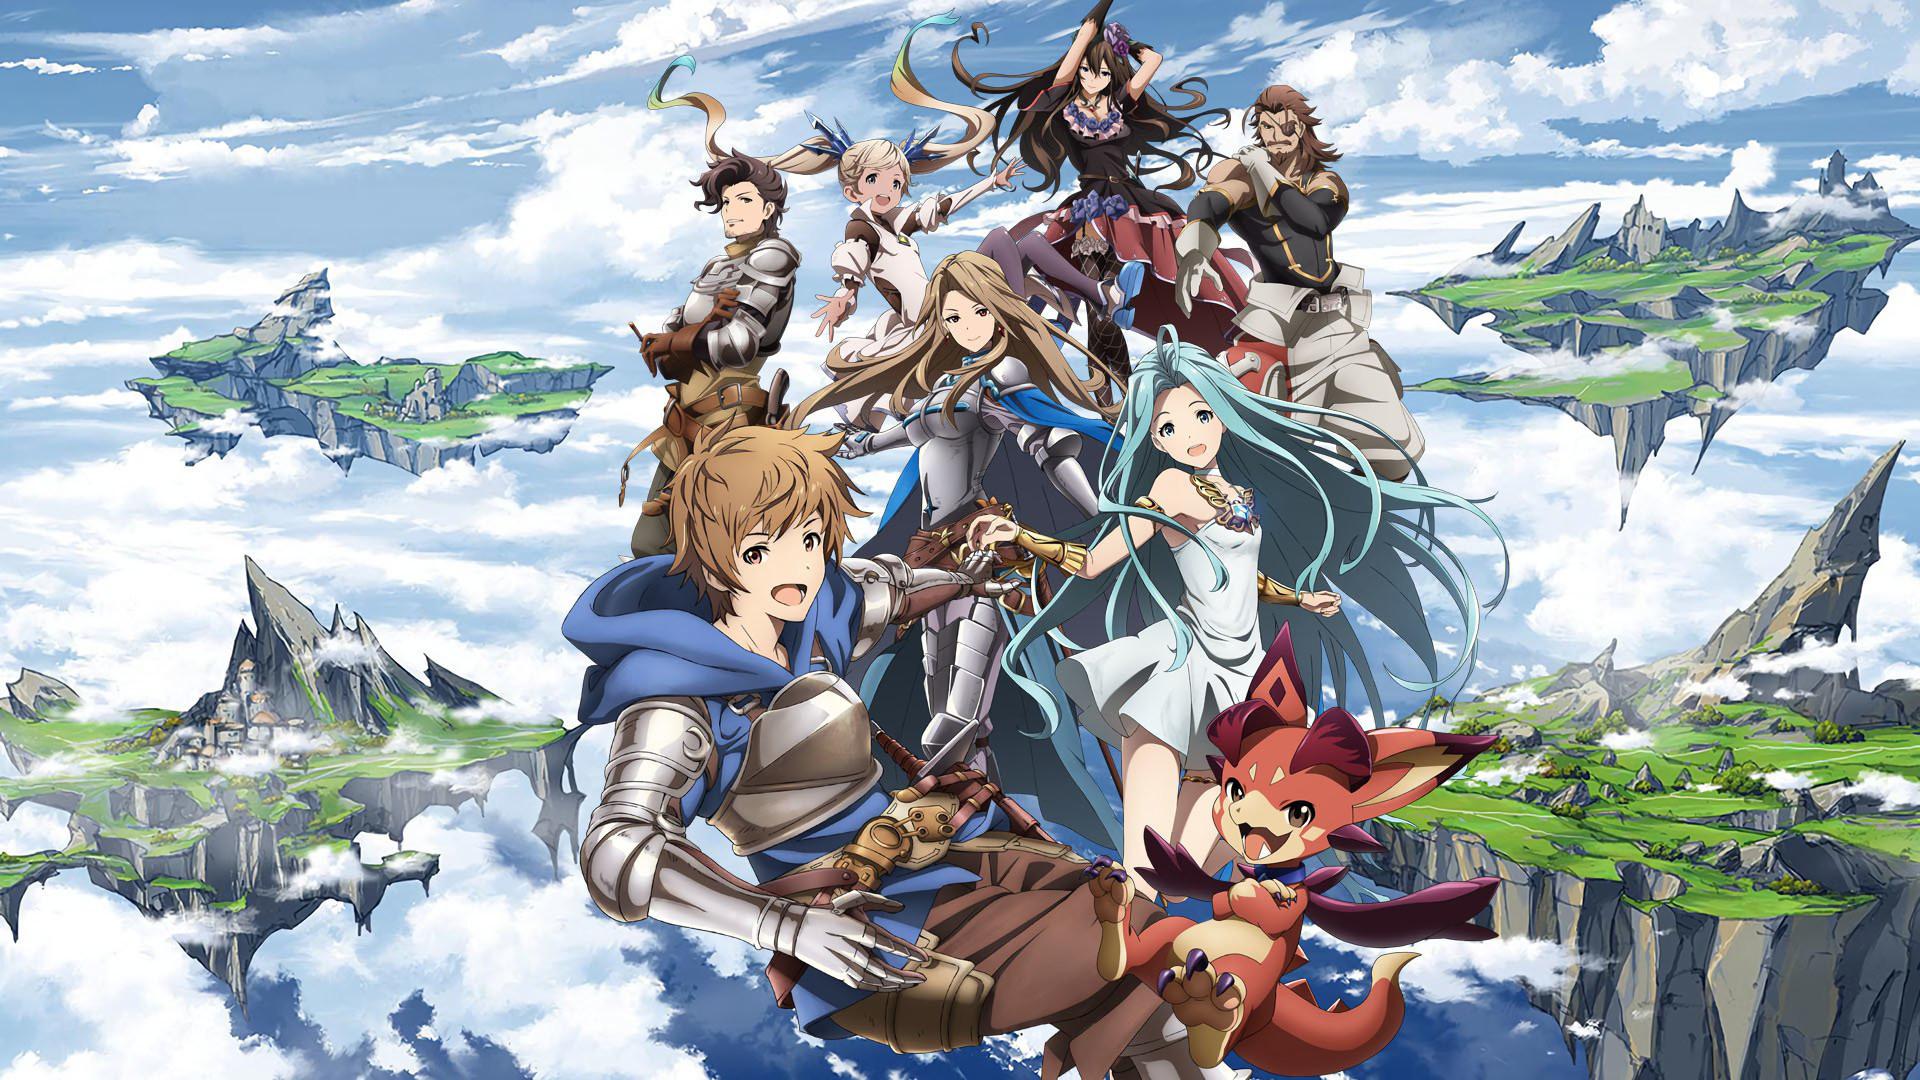 Res: 1920x1080, 1920x1200 Final Fantasy Cloud Anime wallpaper. | HD Wallpapers | Pinterest  | Final fantasy cloud